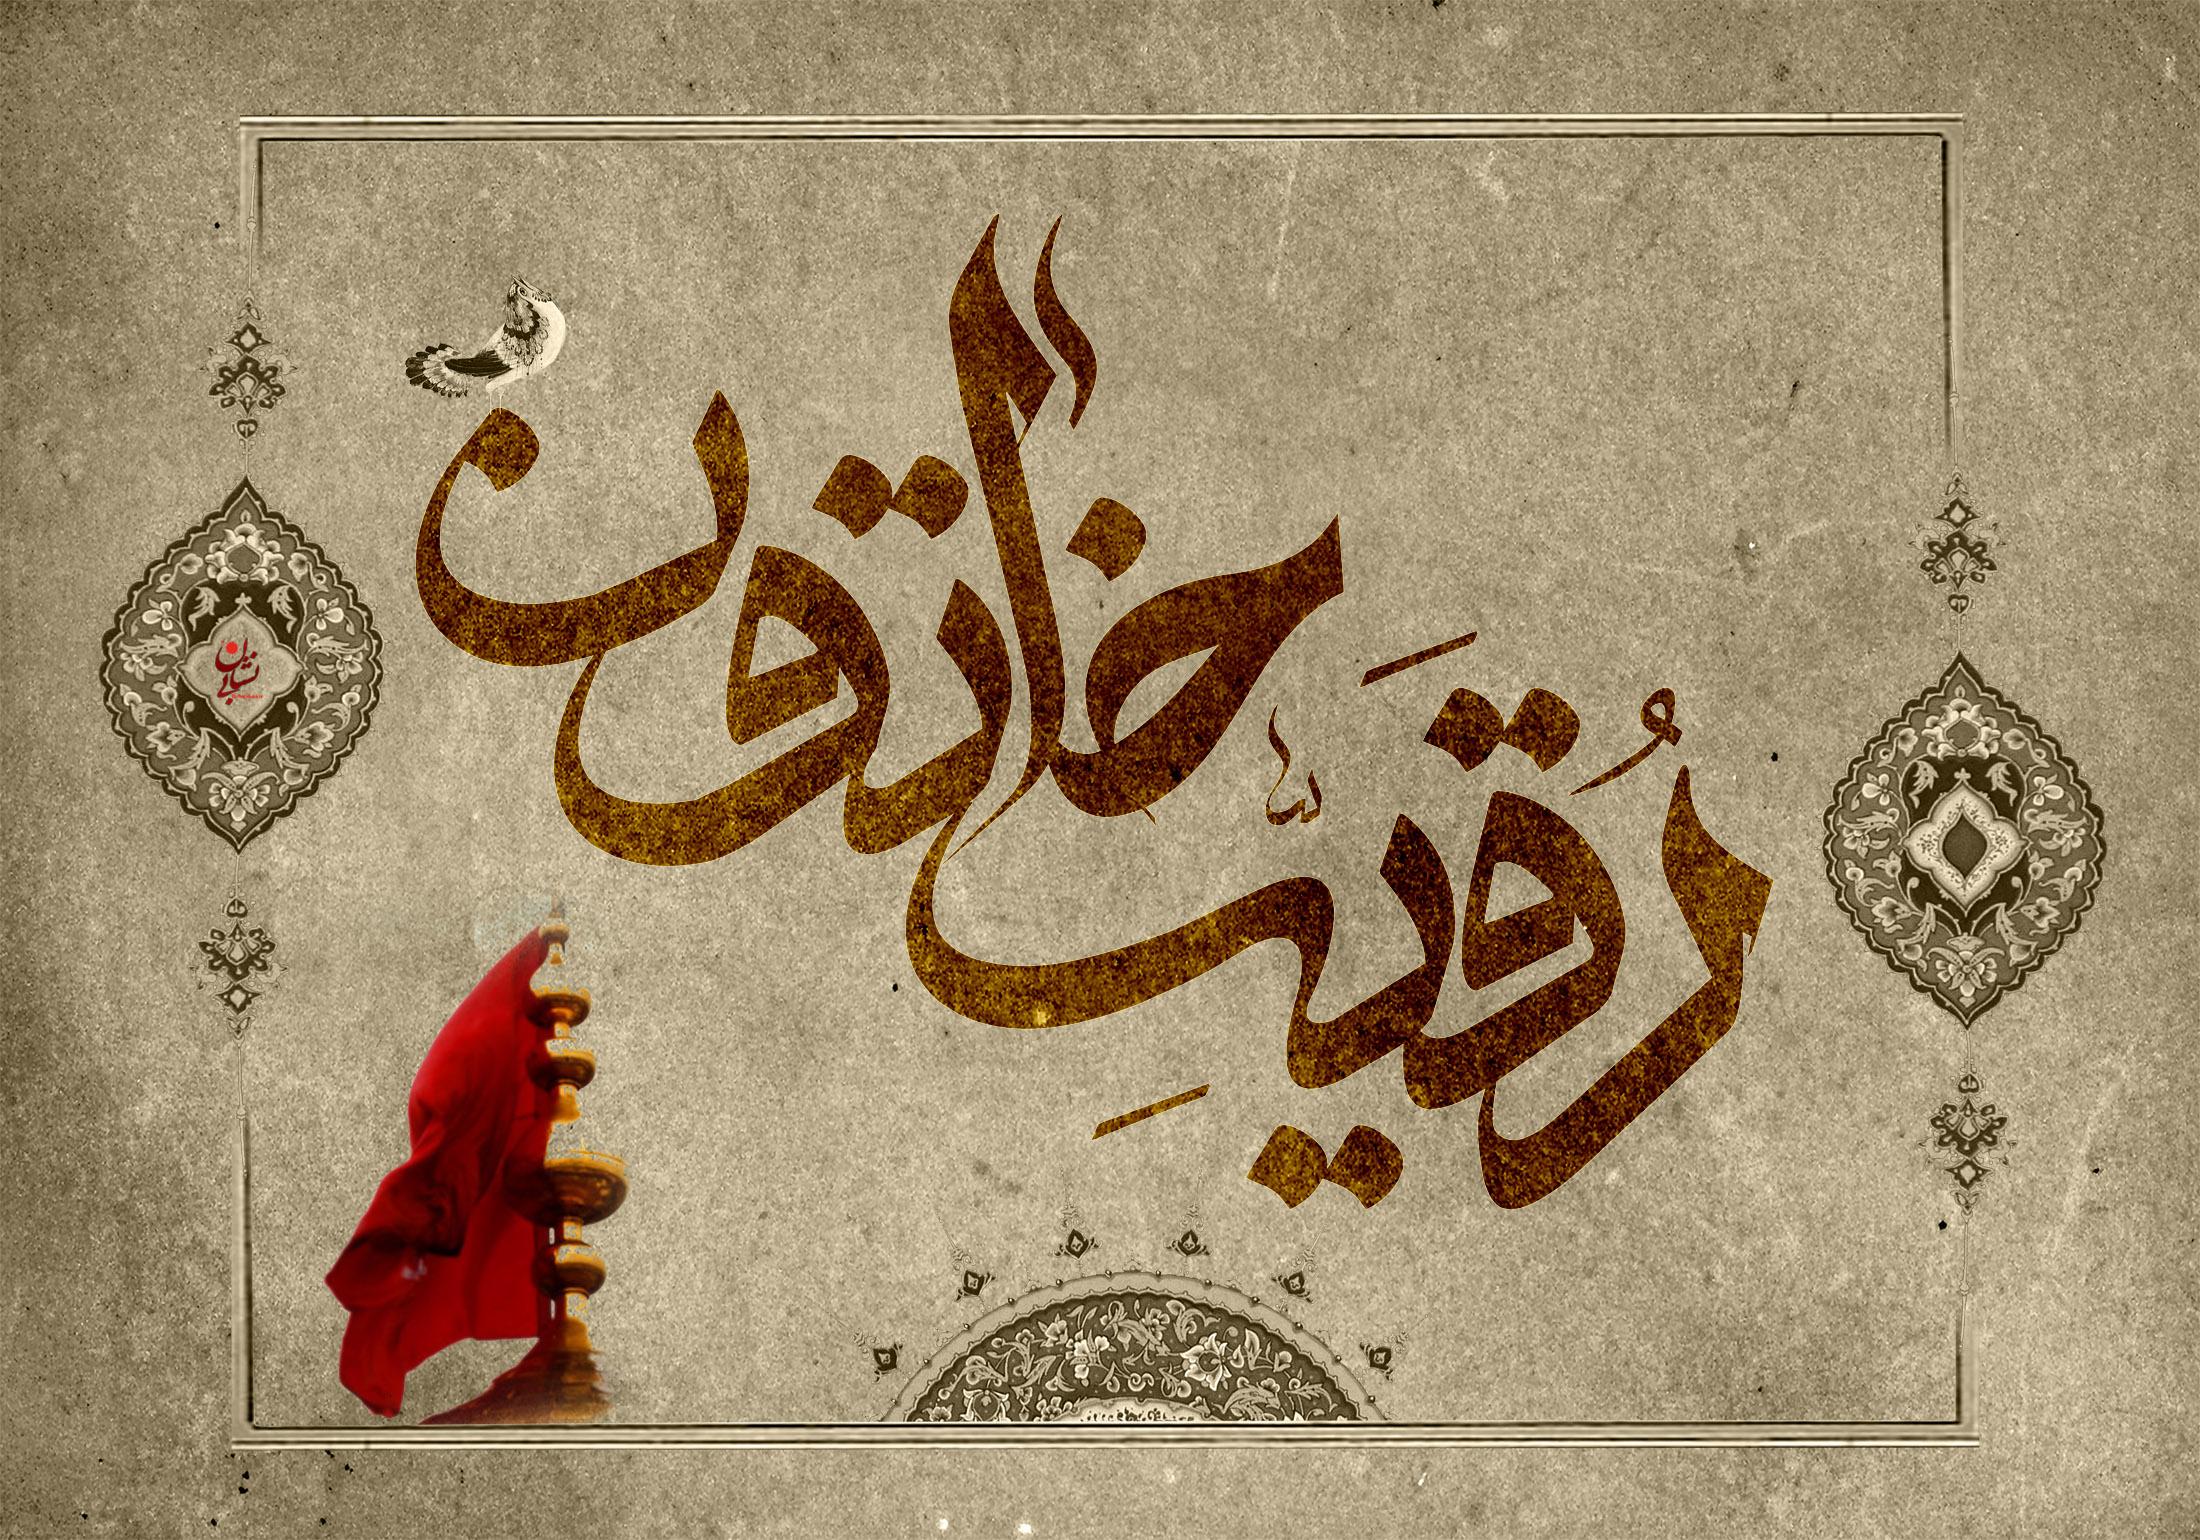 http://bi-neshan.ir/wp-content/uploads/2013/11/H.Roghayeha-9.jpg